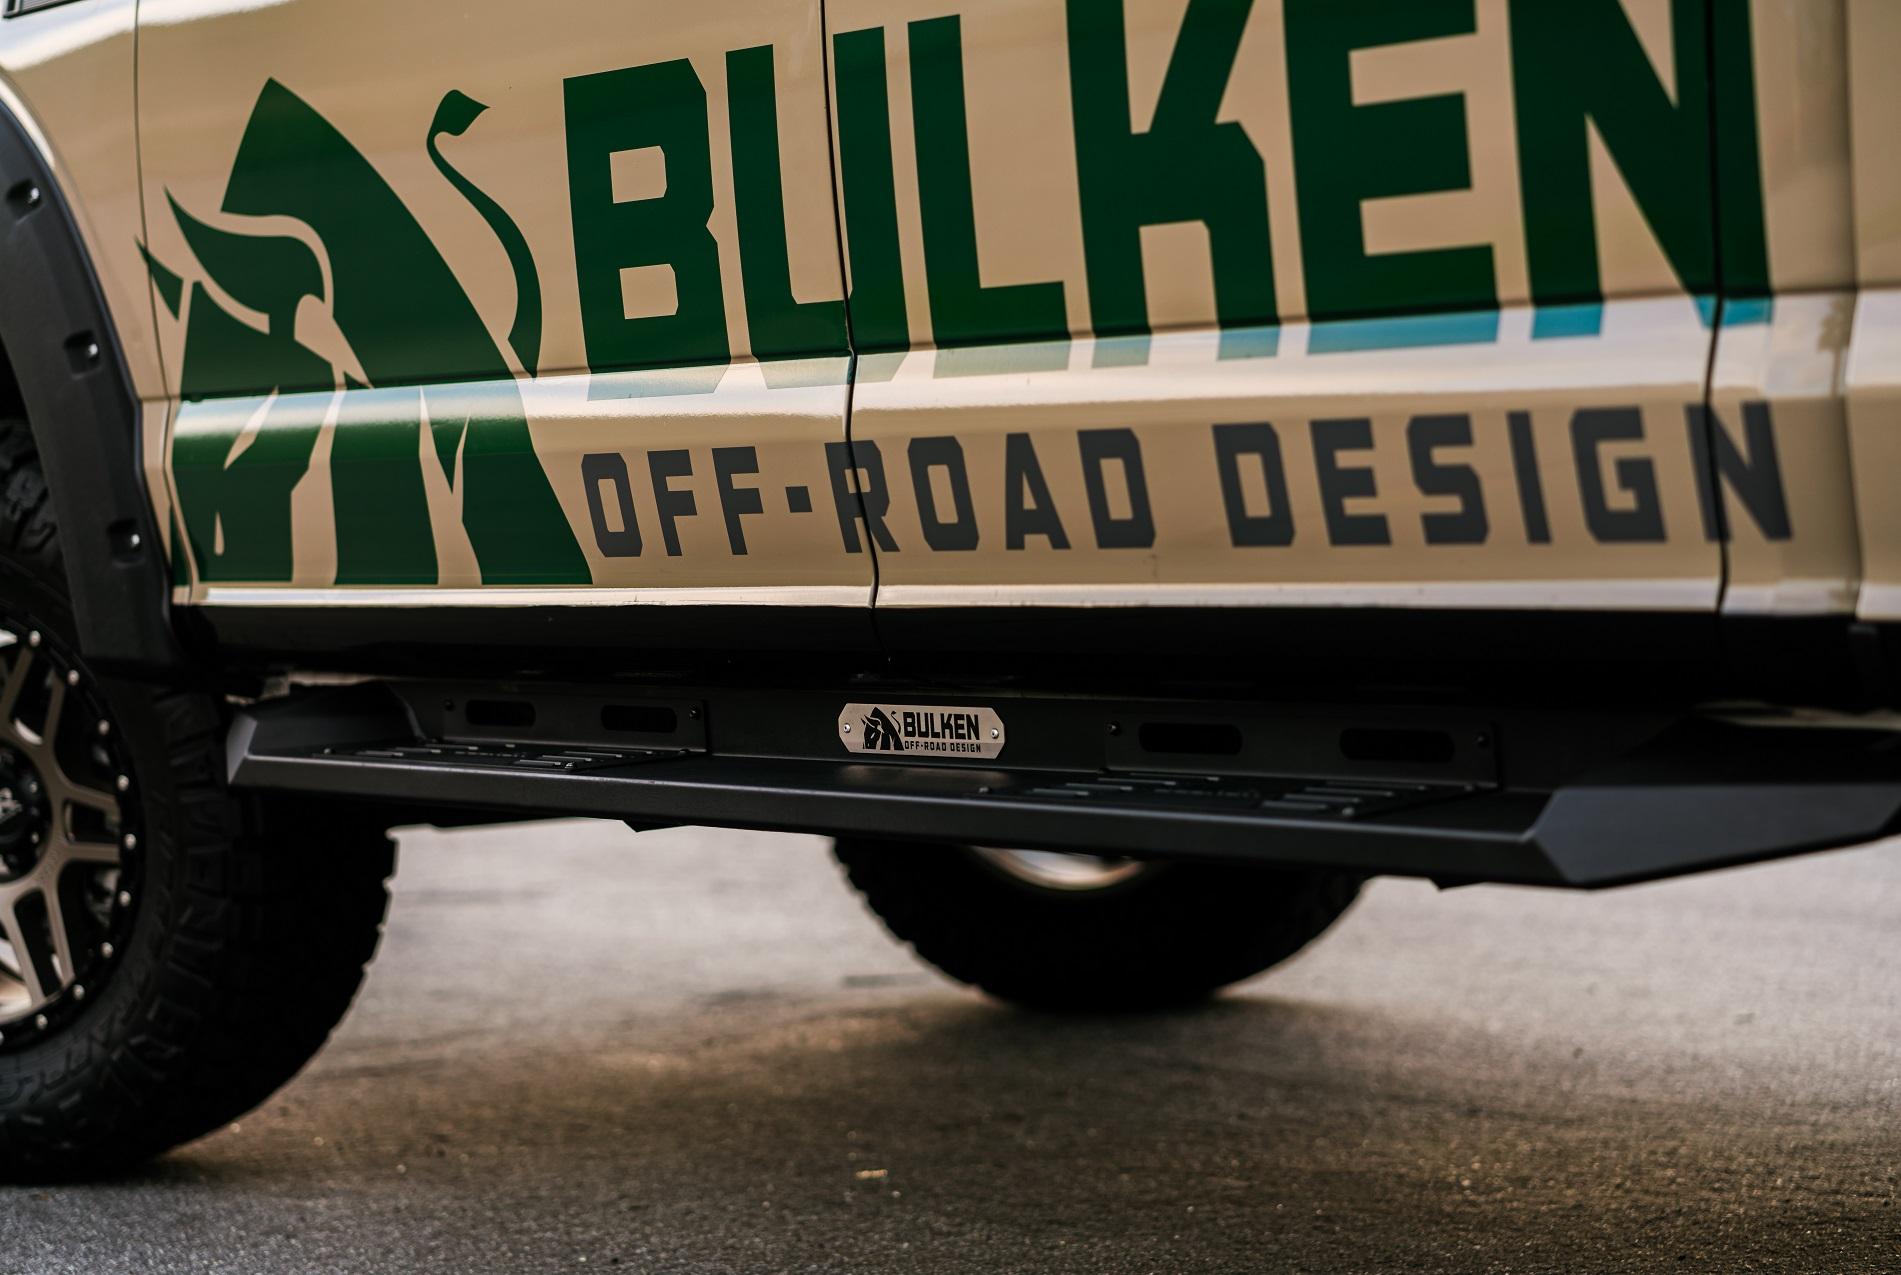 Bulken Off Road Design